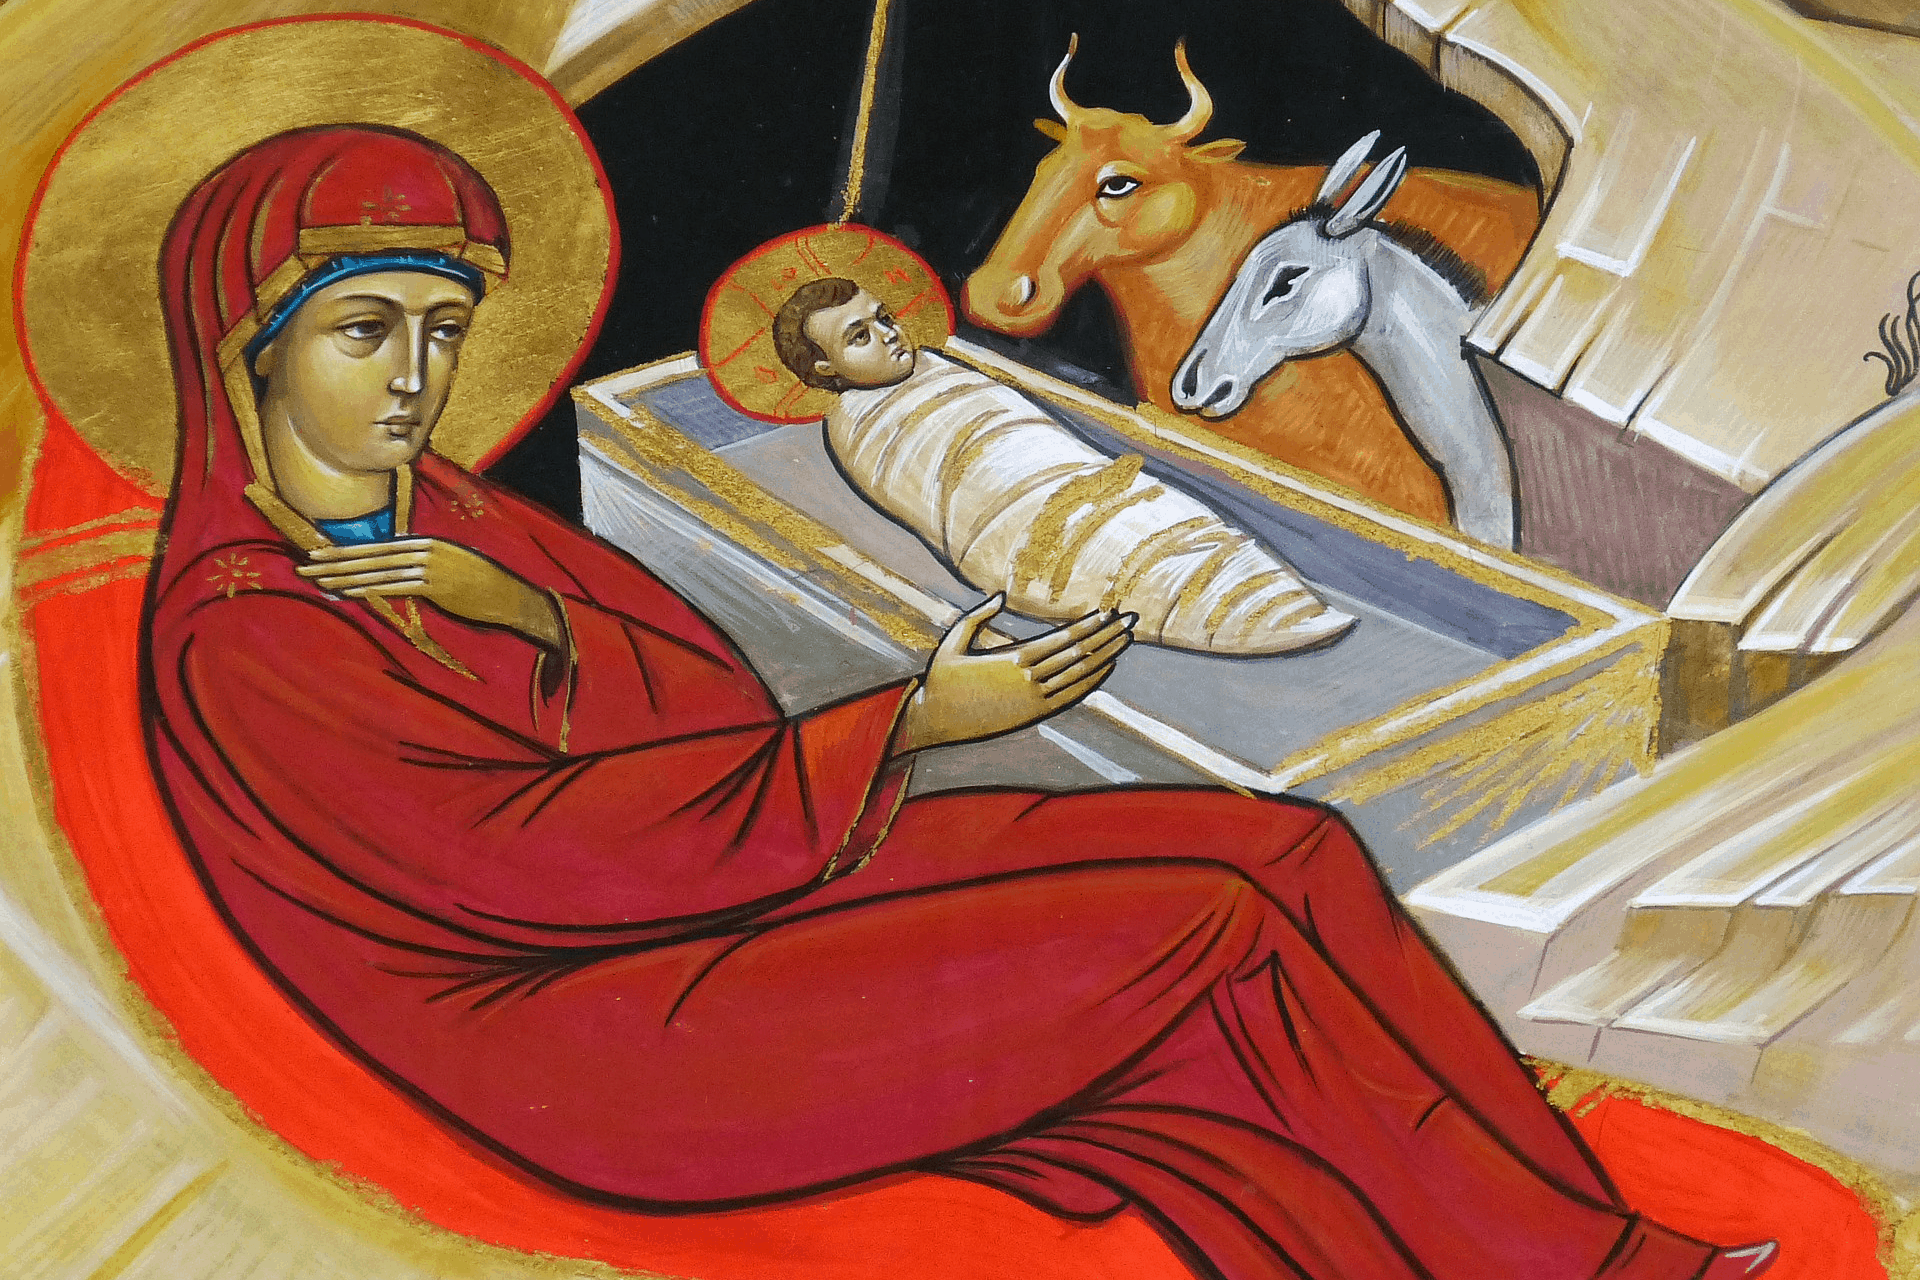 jezus-maria-ezel-rund-kerstmis-olv-ter-nood-heiloo